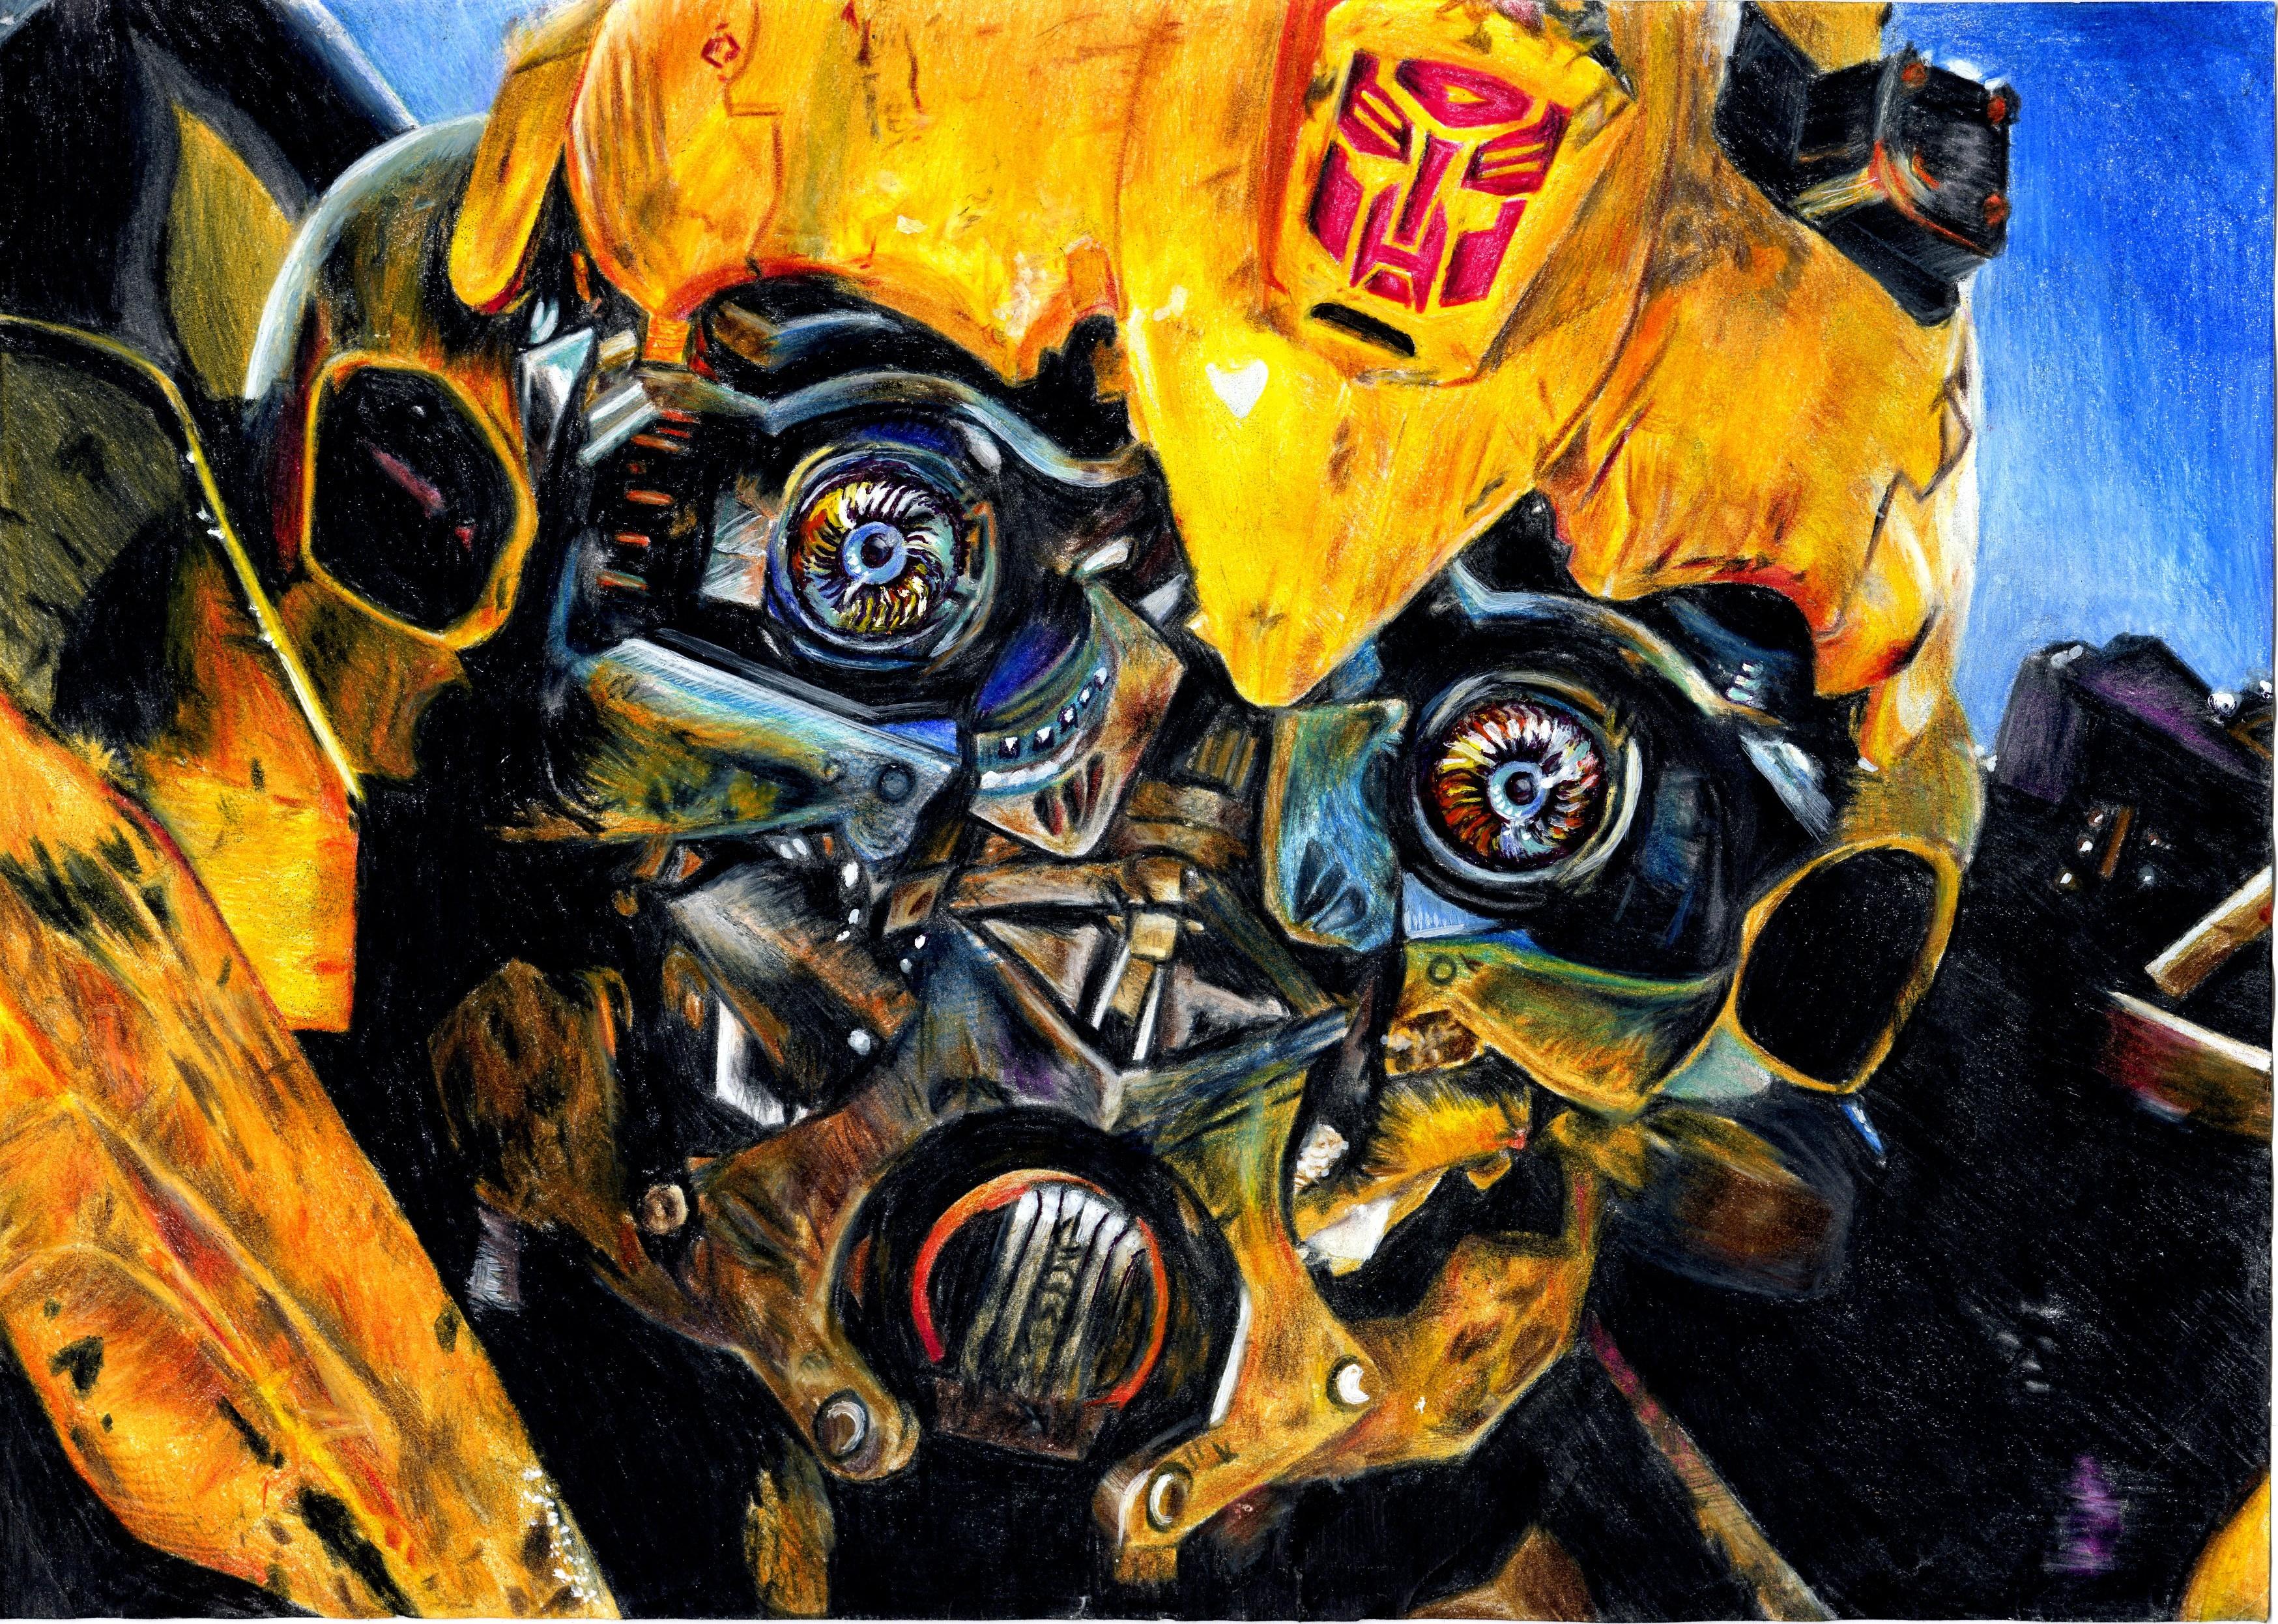 Bumblebee Artwork 4k Hd Artist 4k Wallpapers Images Backgrounds